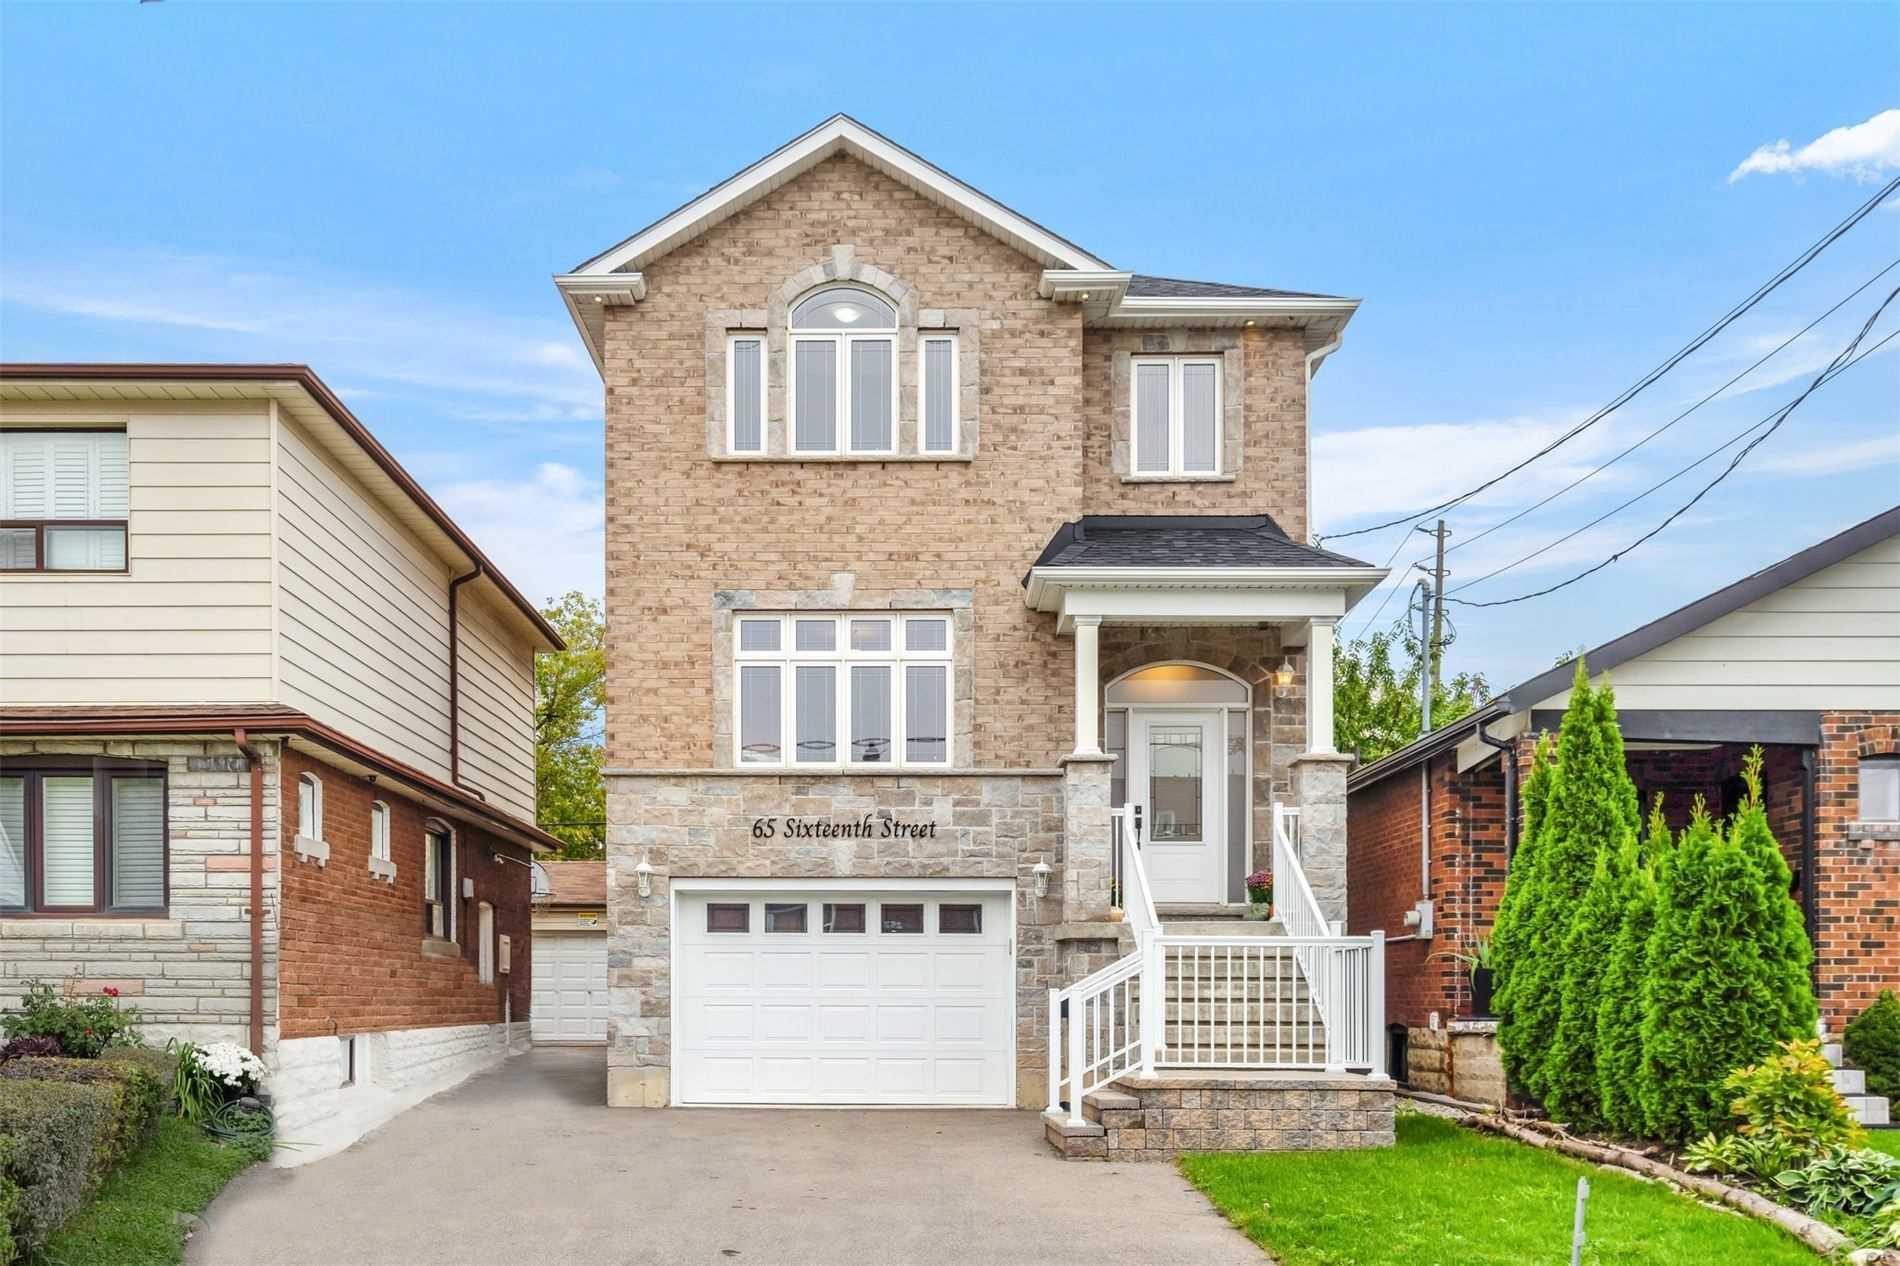 65 Sixteenth St, Toronto, Ontario M8V3J9, 3 Bedrooms Bedrooms, 7 Rooms Rooms,4 BathroomsBathrooms,Detached,For Sale,Sixteenth,W5396564